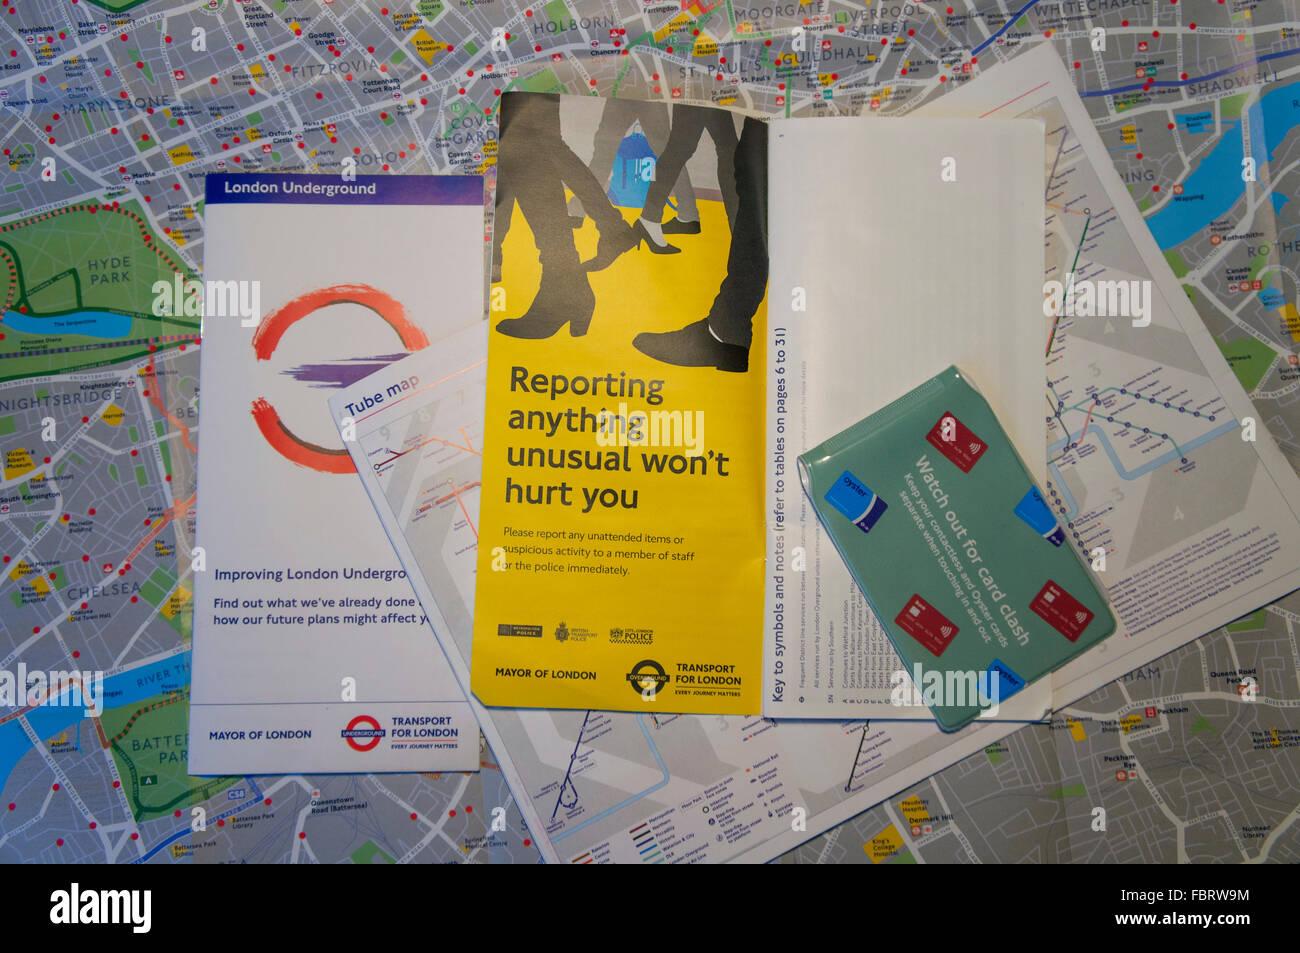 Transport for London London Underground Tube map